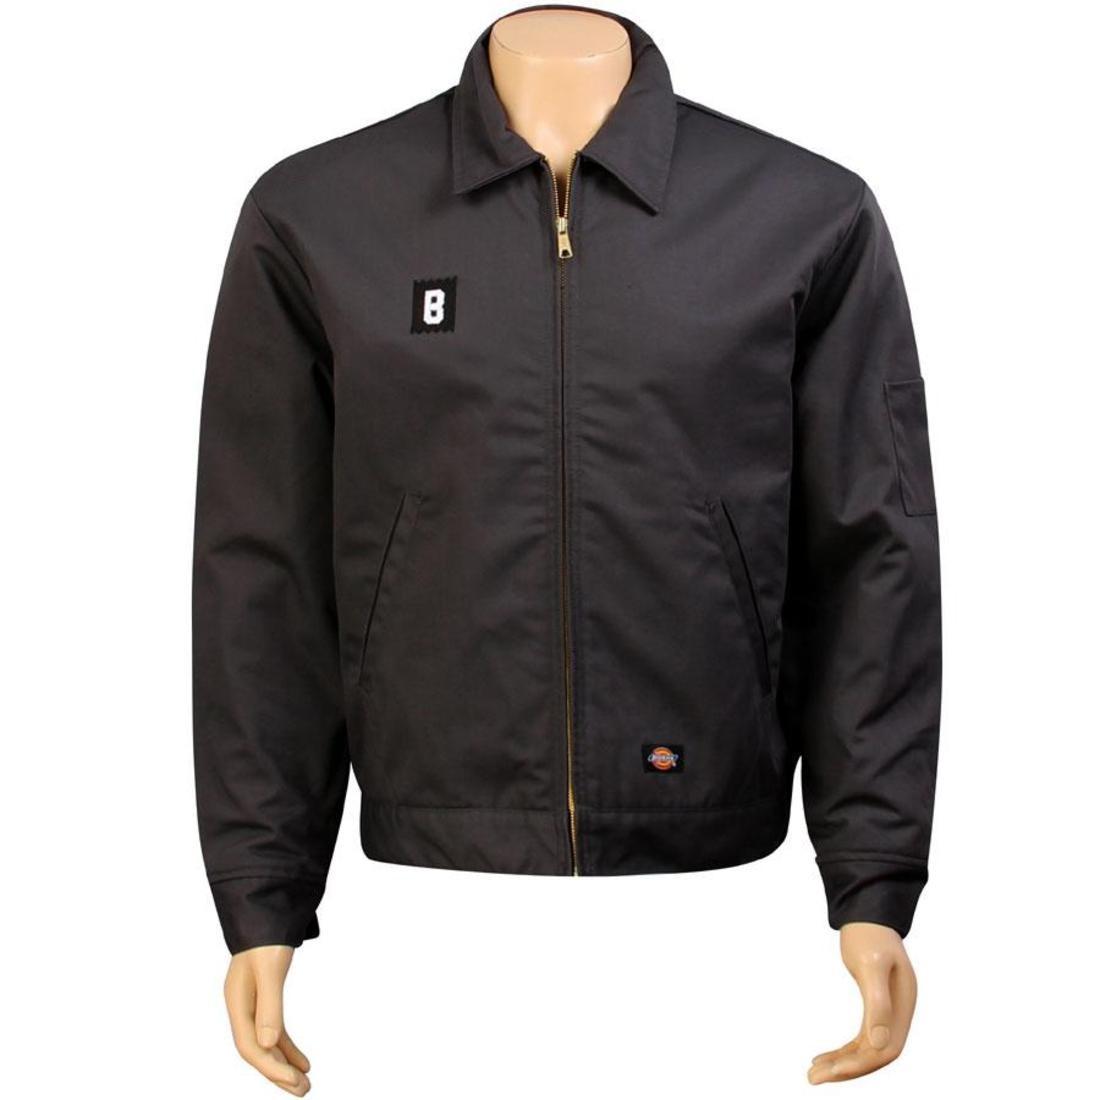 BAIT B Logo Eisenhower Jacket - Dickies (dark grey / white)